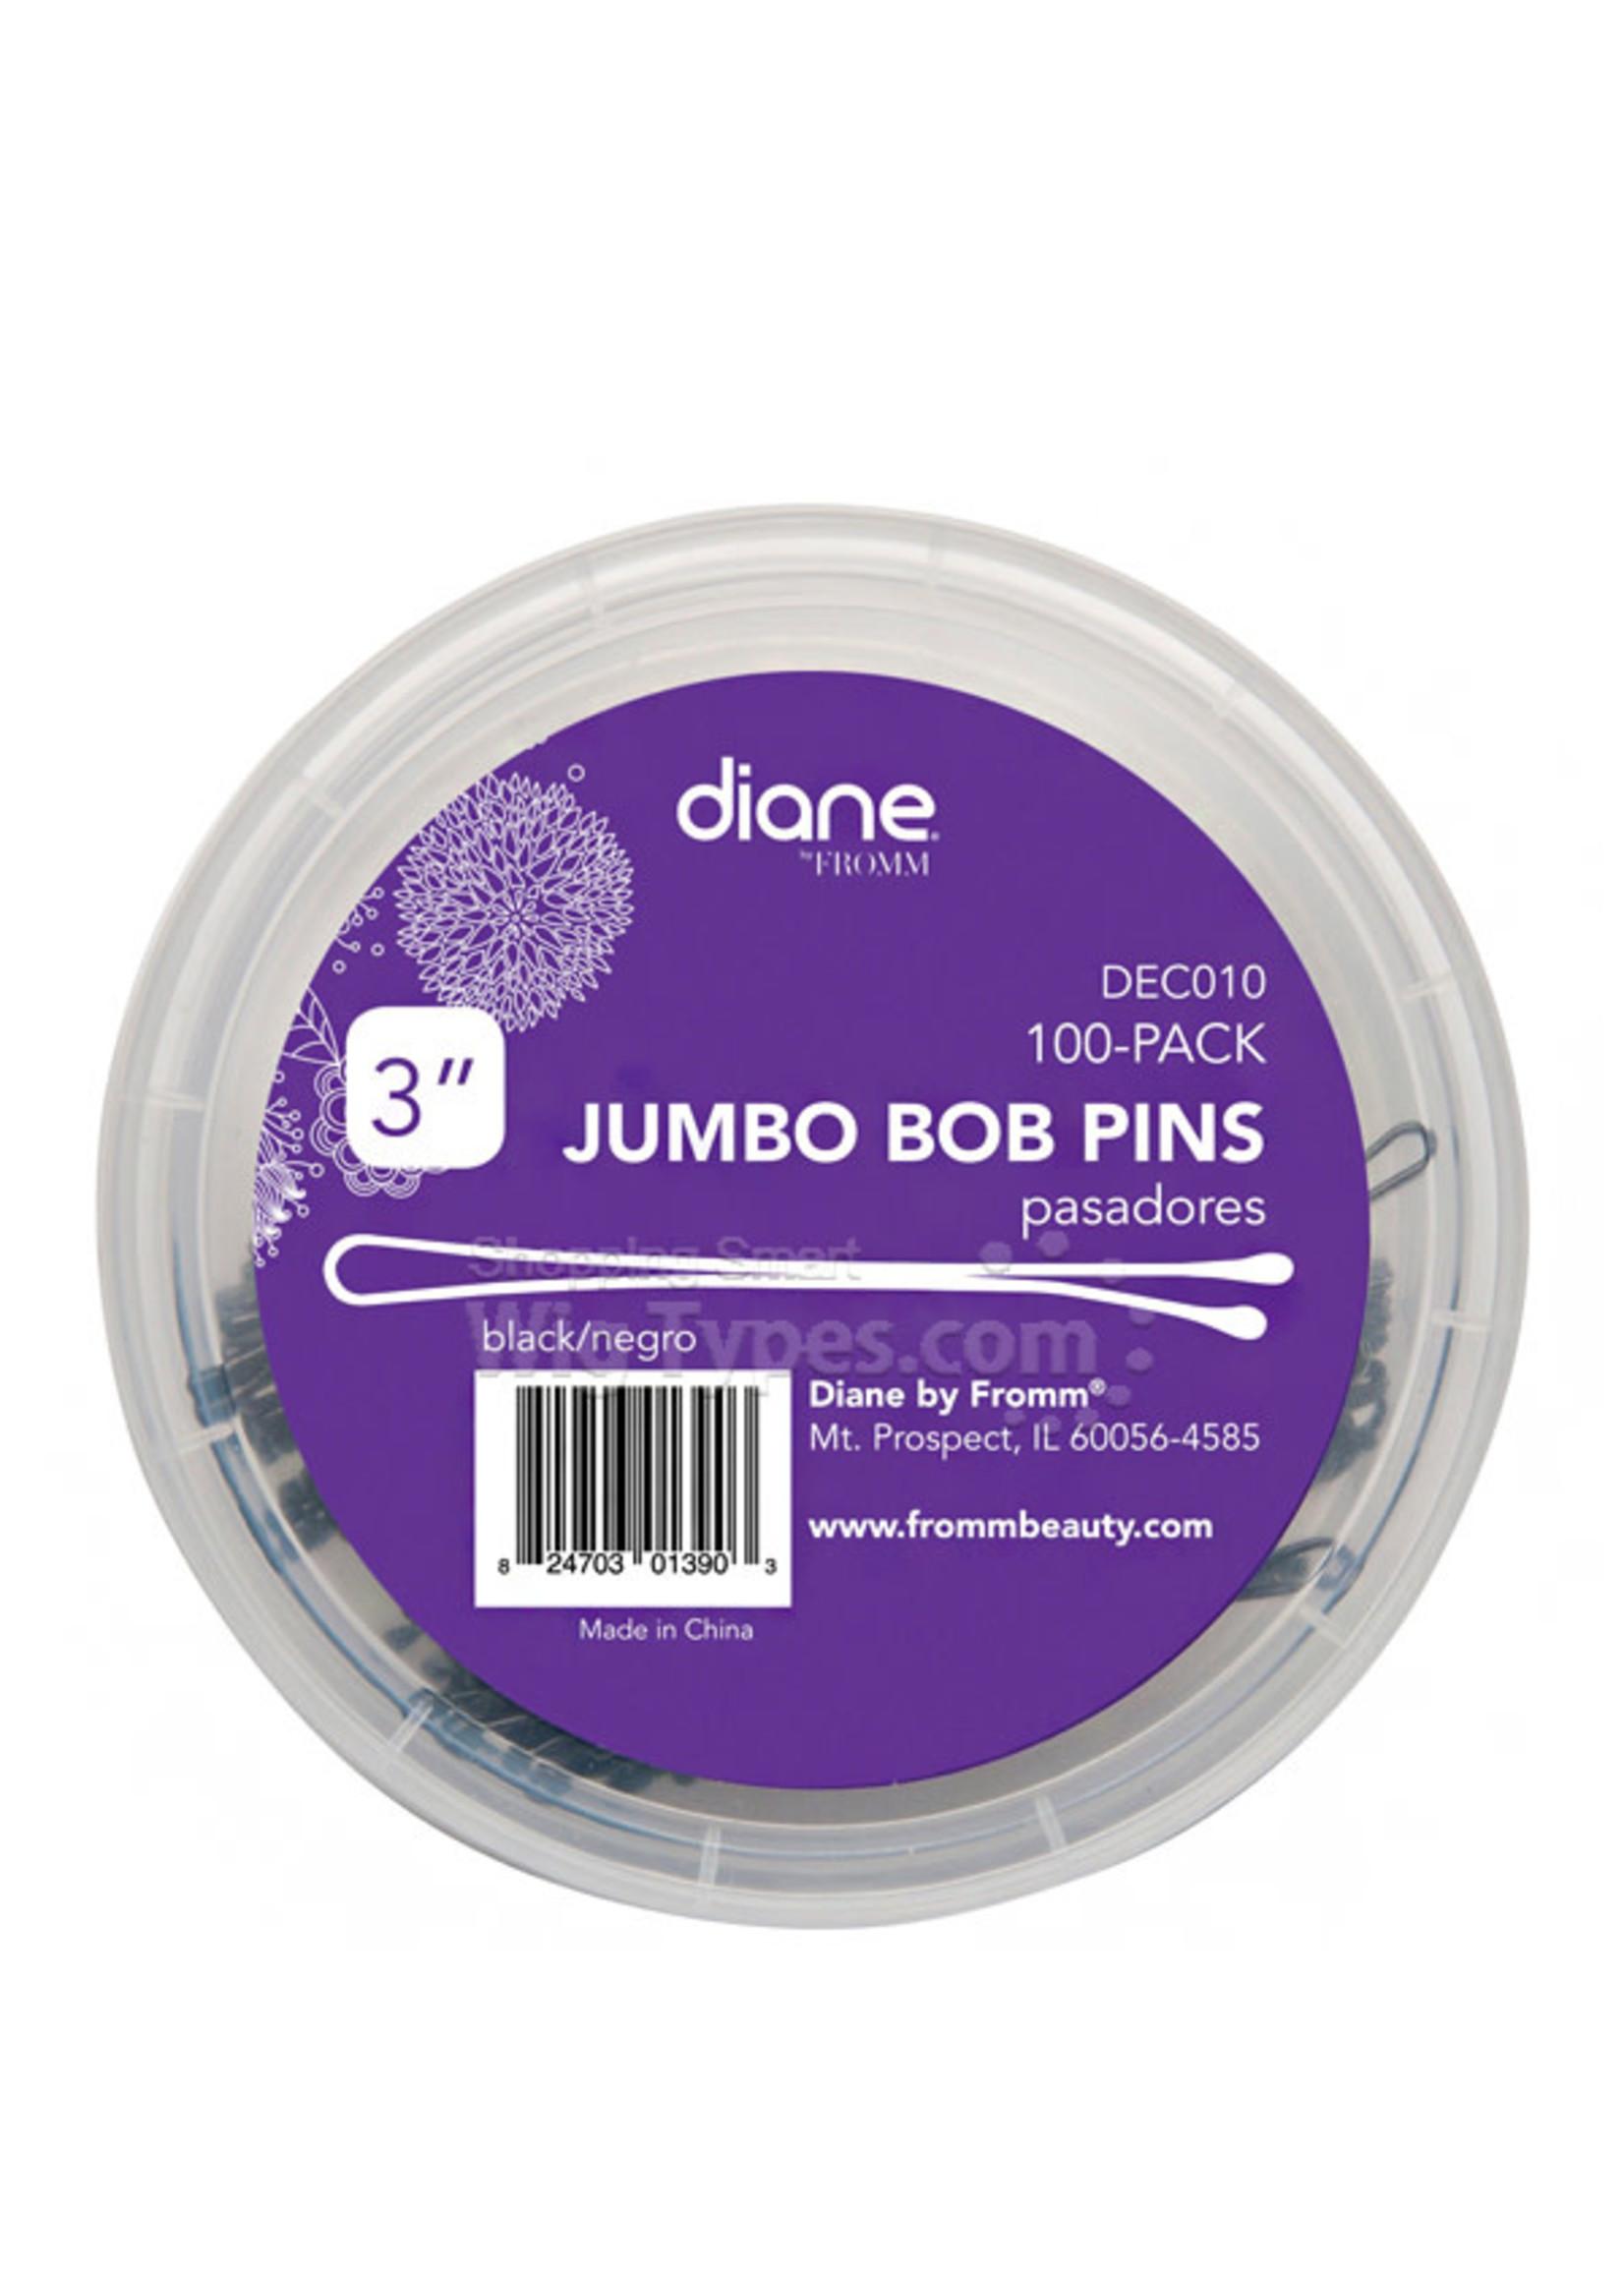 Extra Jumbo Bobbi Pins 3in 100pk